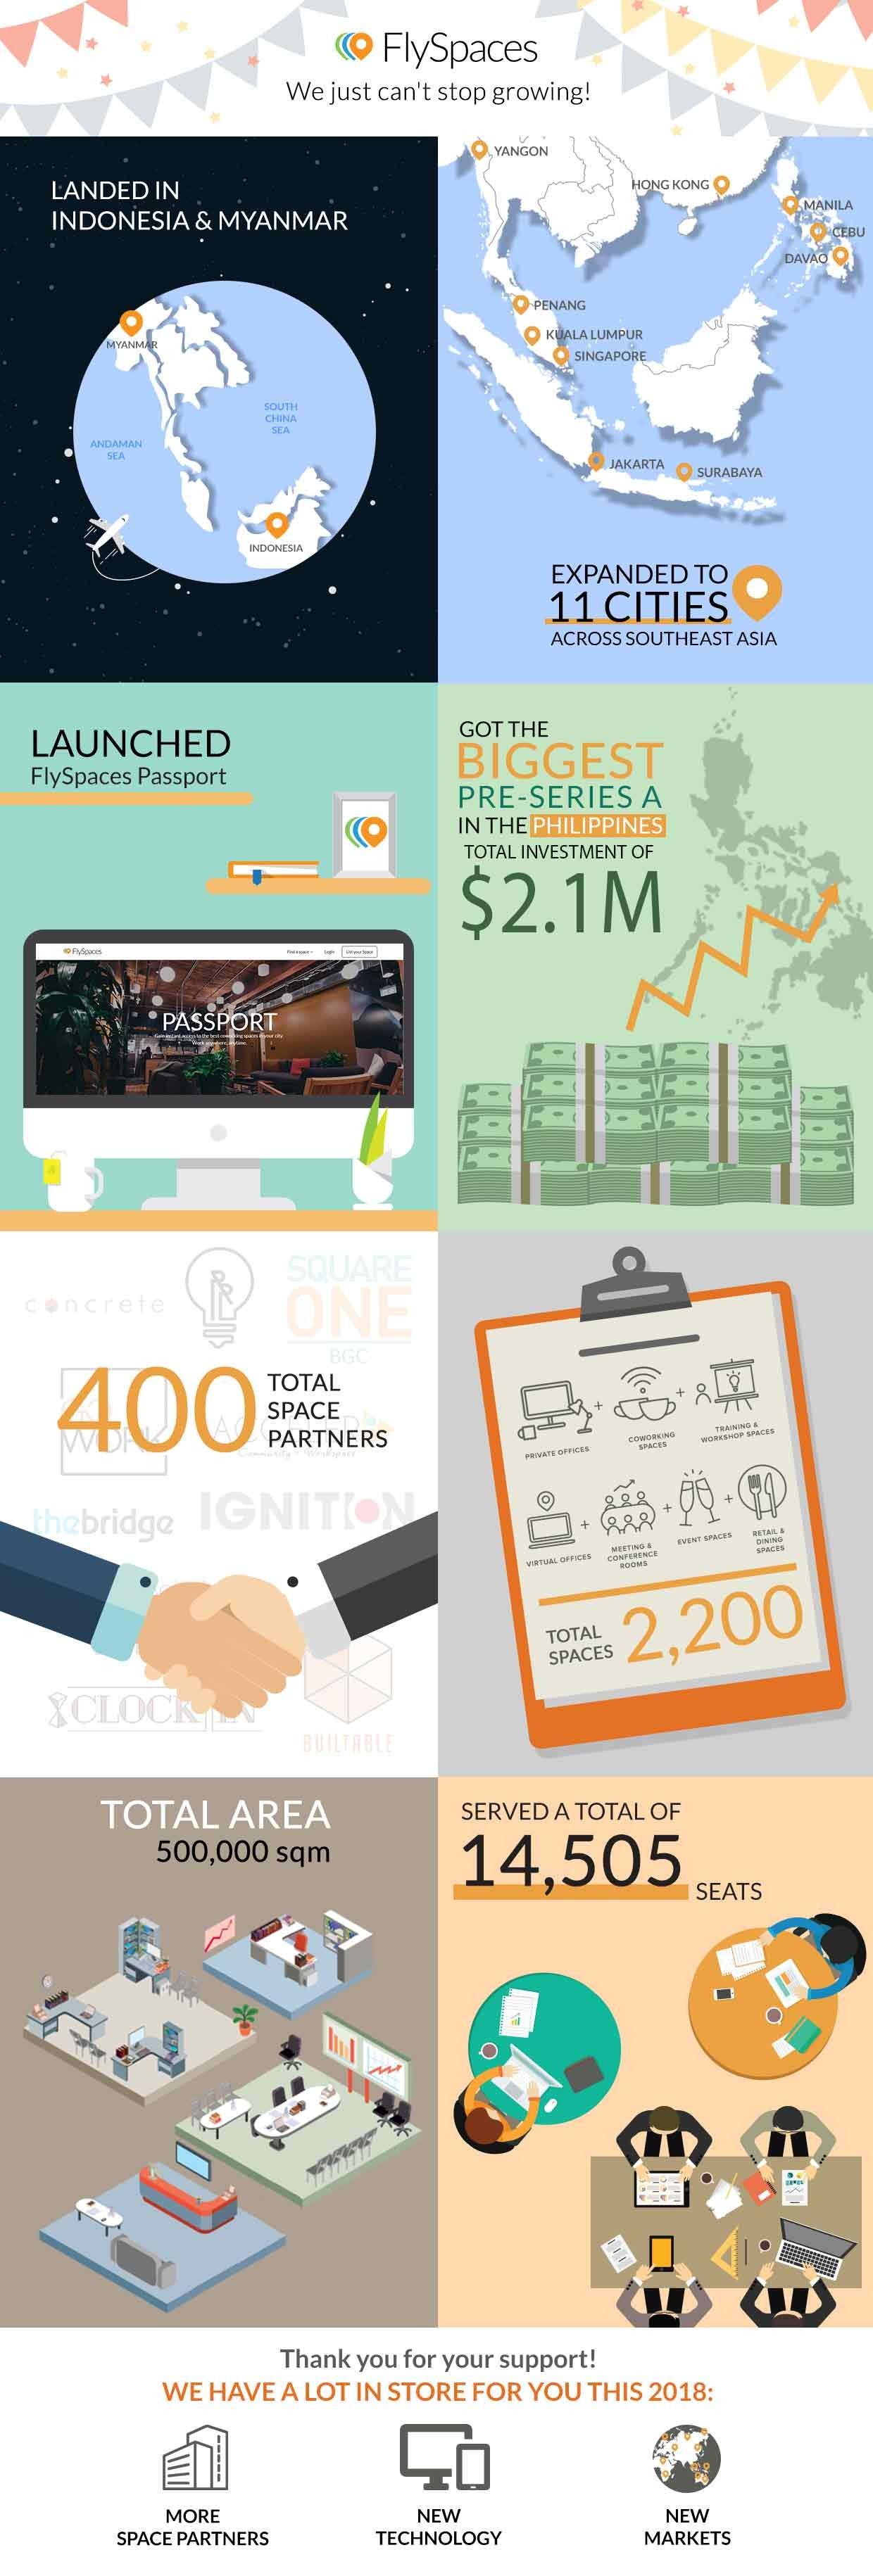 FlySpaces Milestones Infographic Future of Flexible Office Space